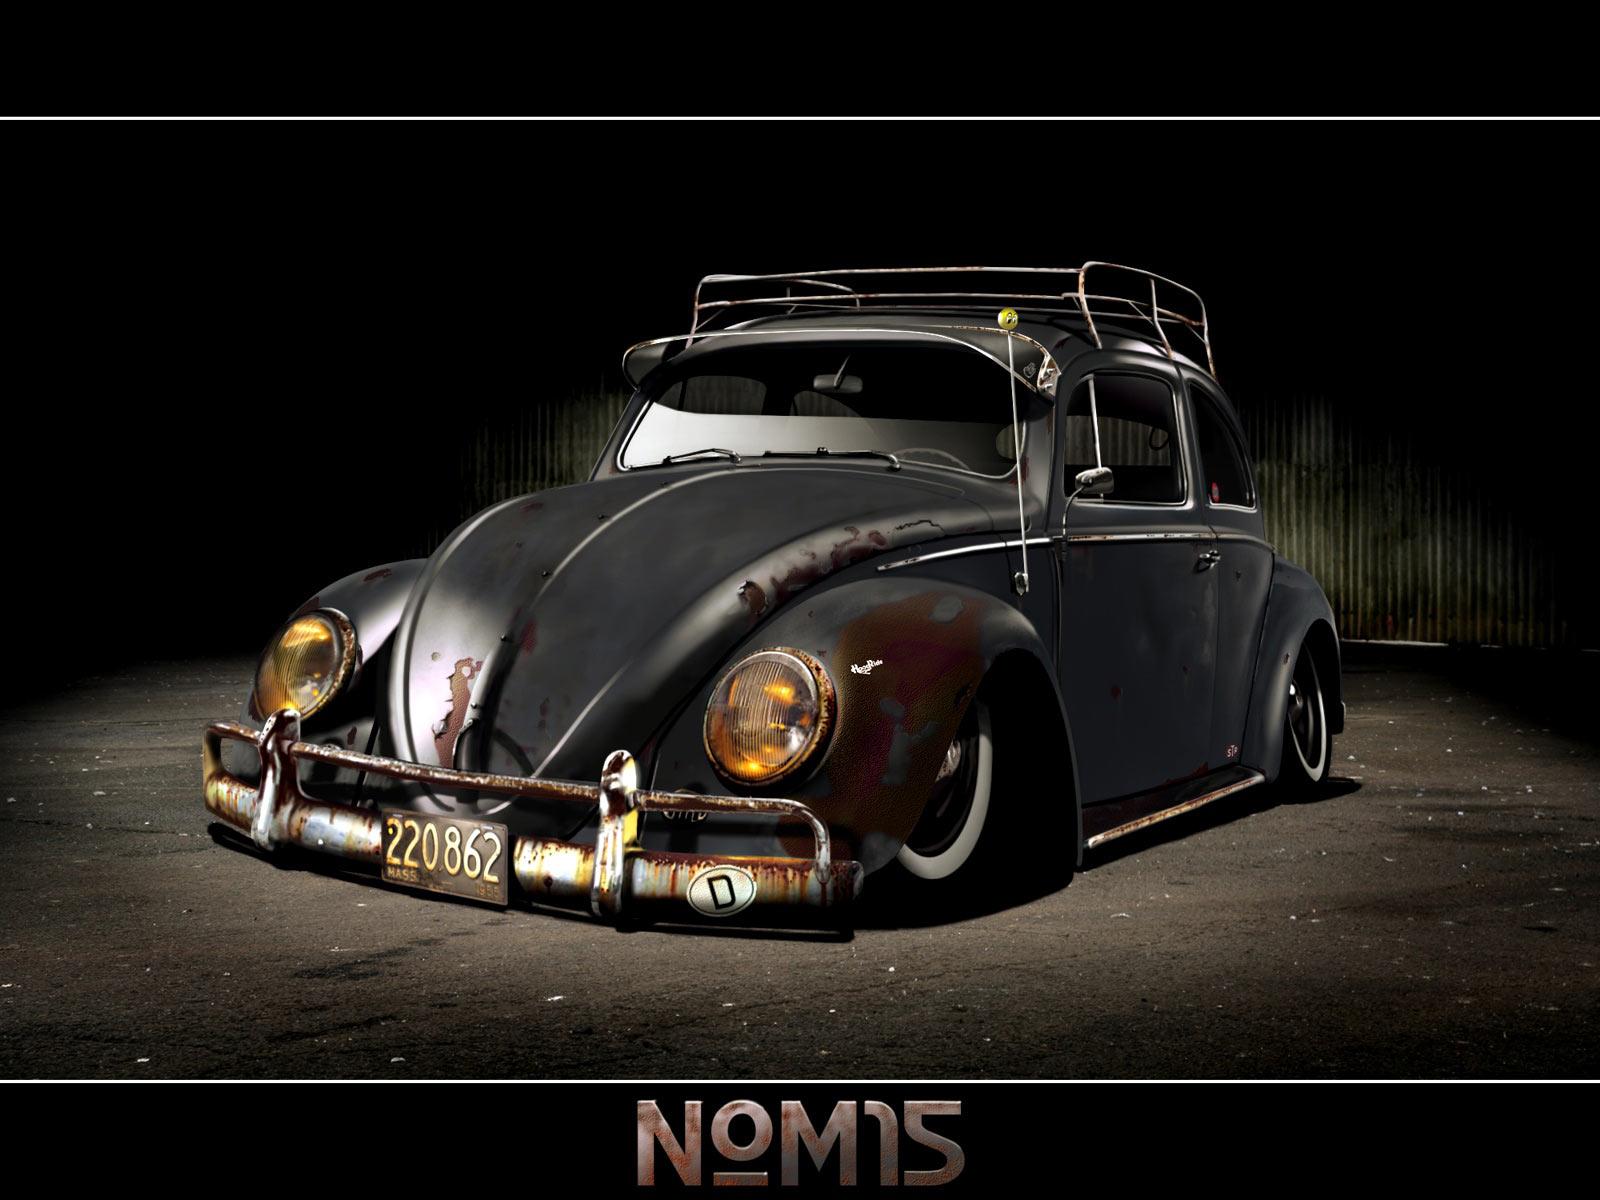 Old car wallpaper for desktop Its My Car Club 1600x1200